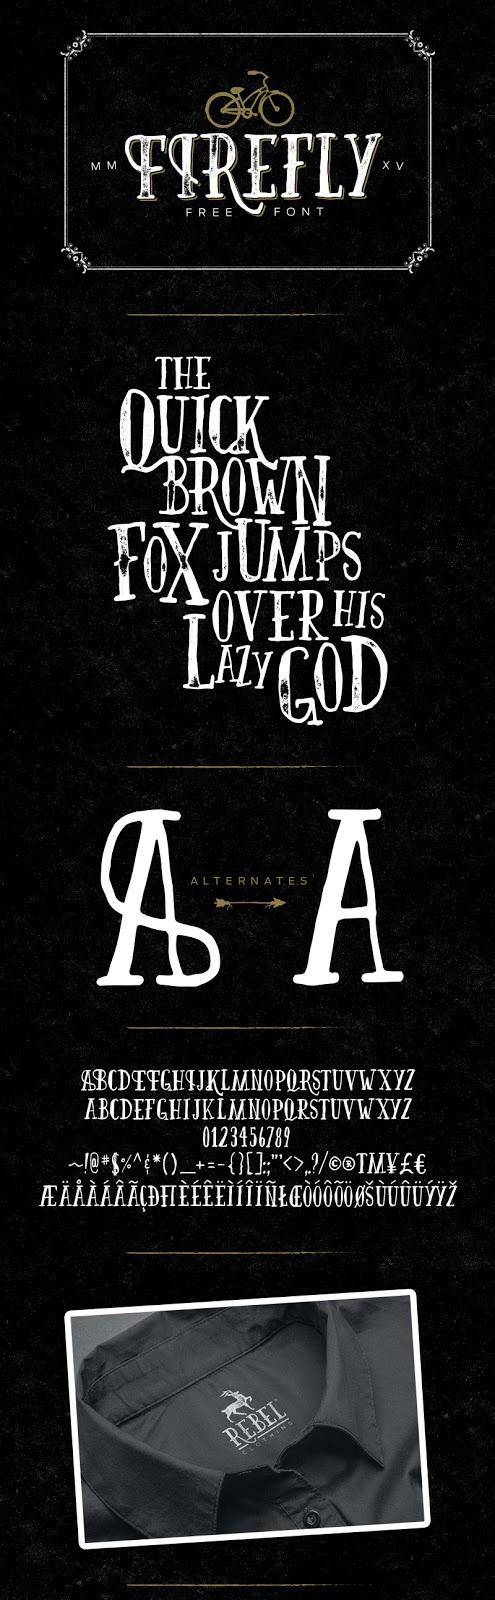 font, günün fontu, font indir, font dosyası indir, bedava font indir, kaliteli font indir, firefly font indir,